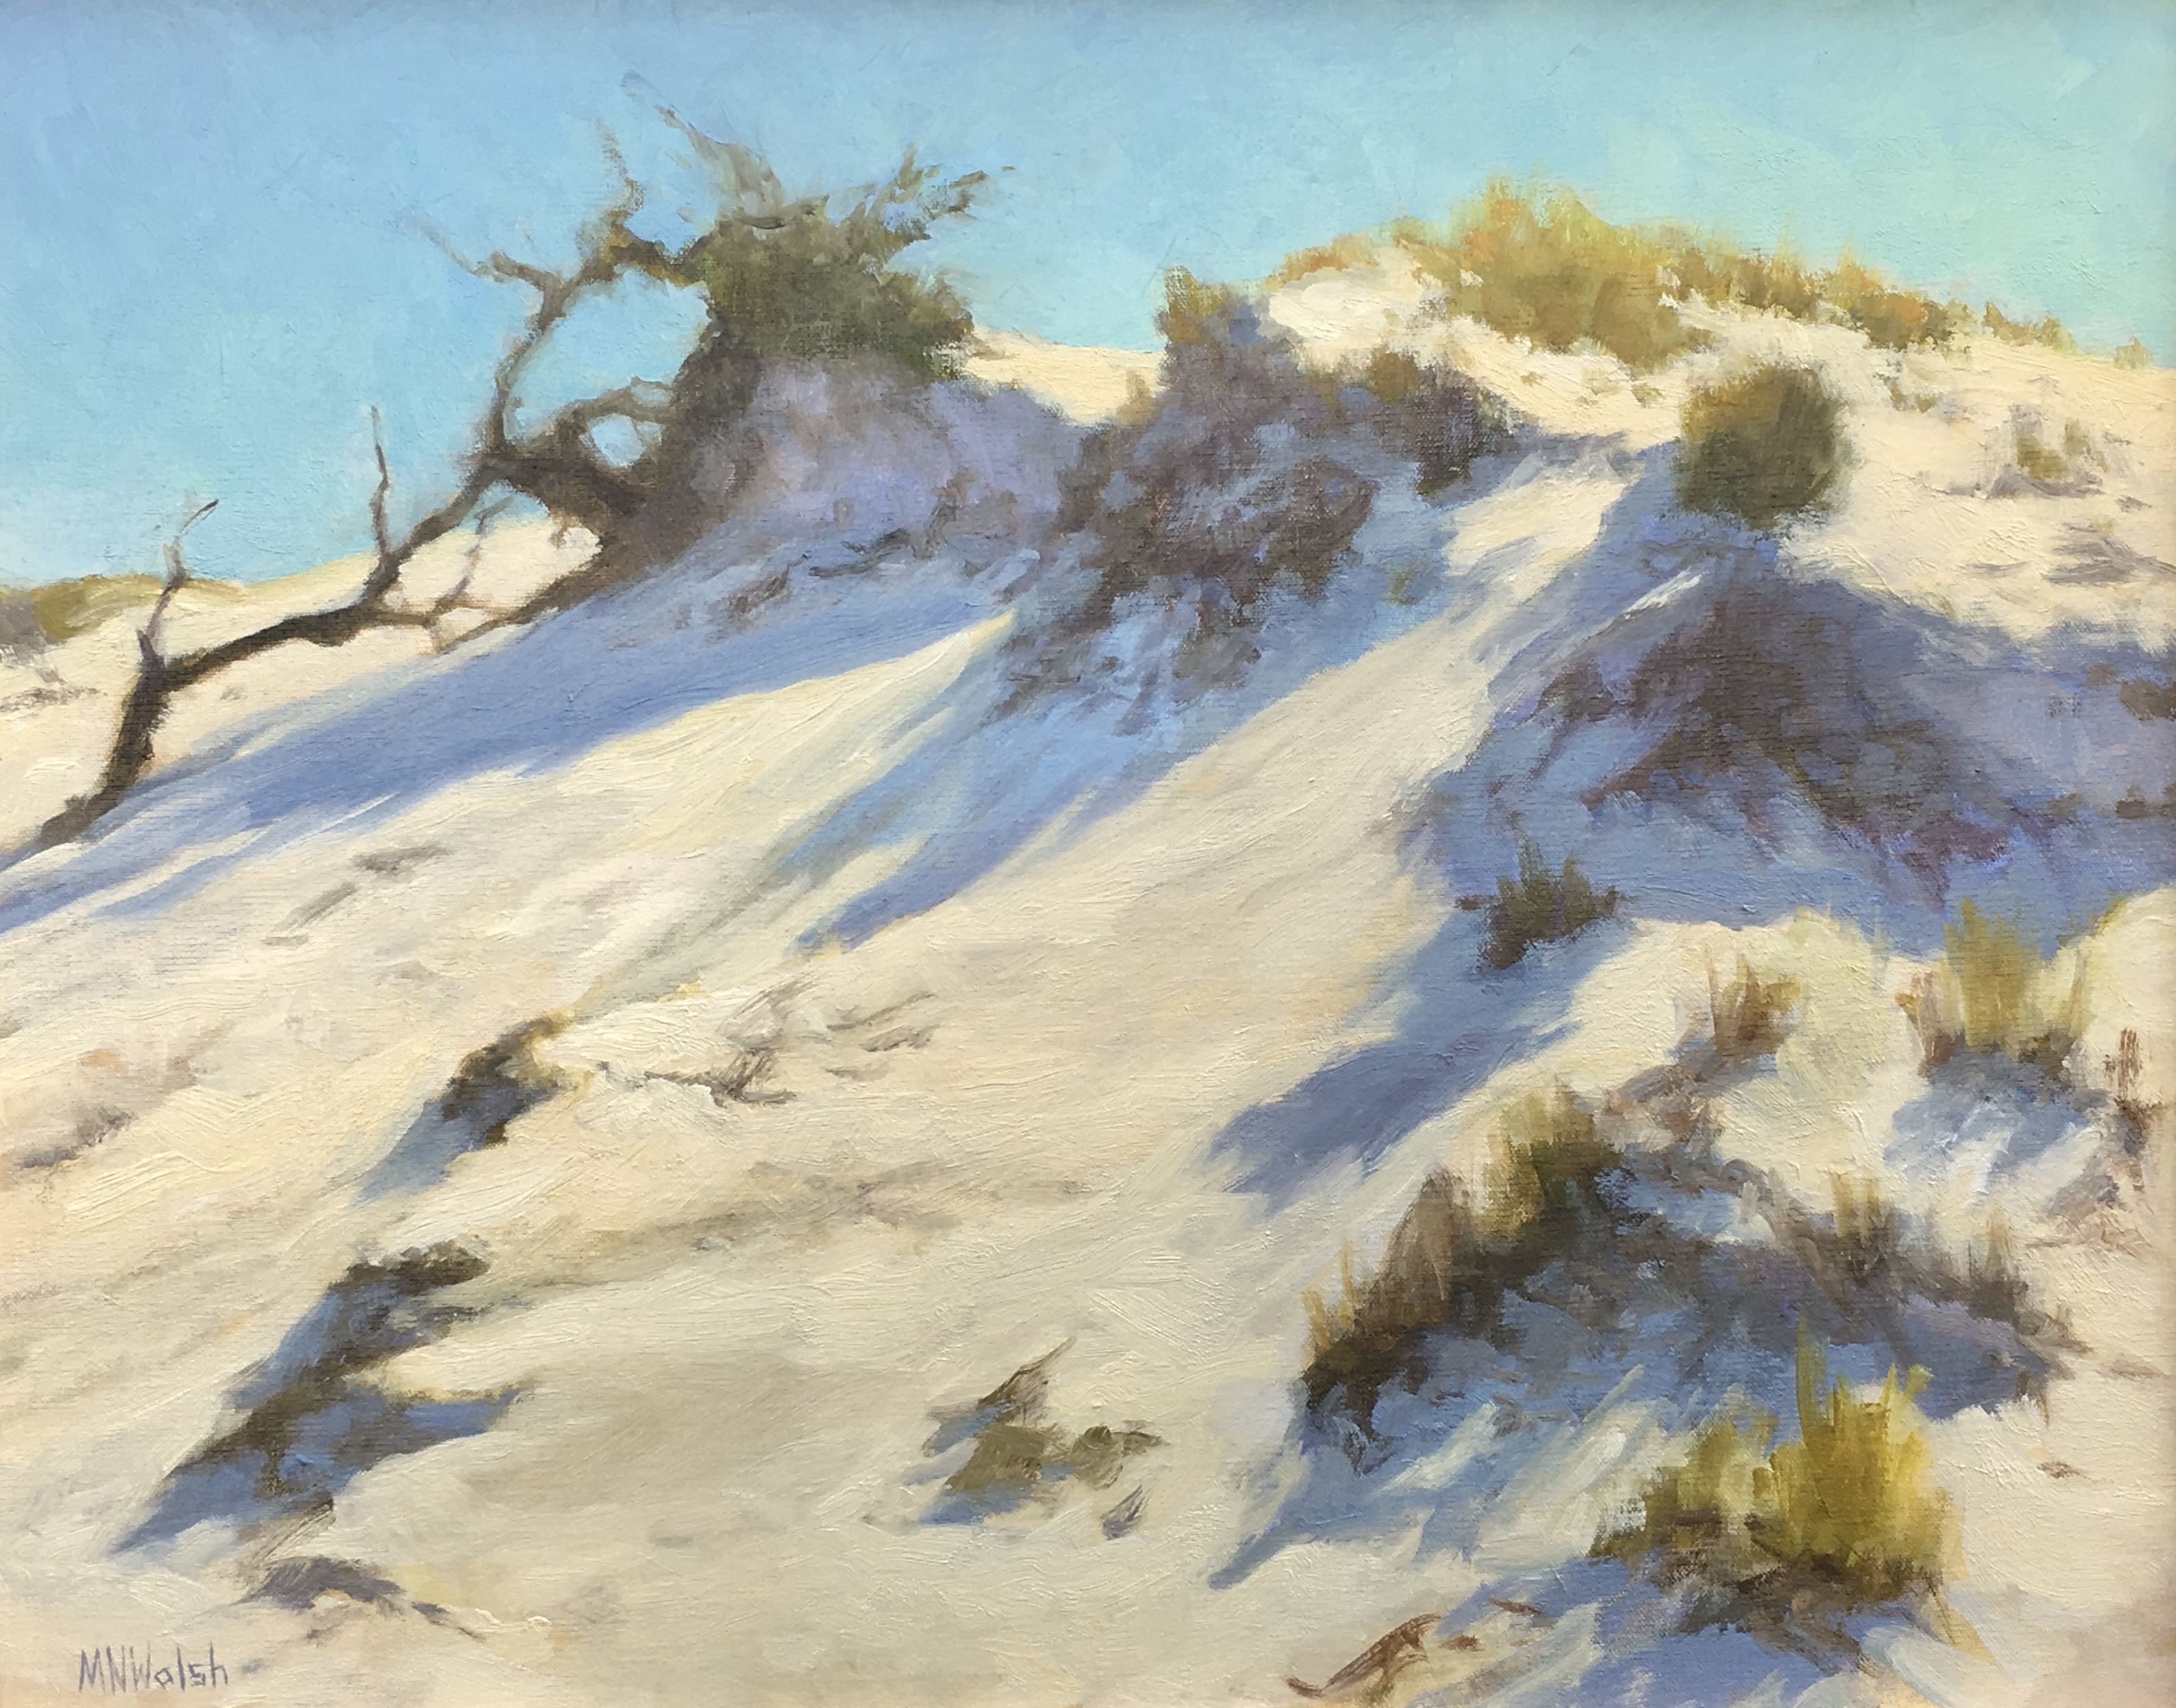 Dune,Walsh oil 16x20 $1800